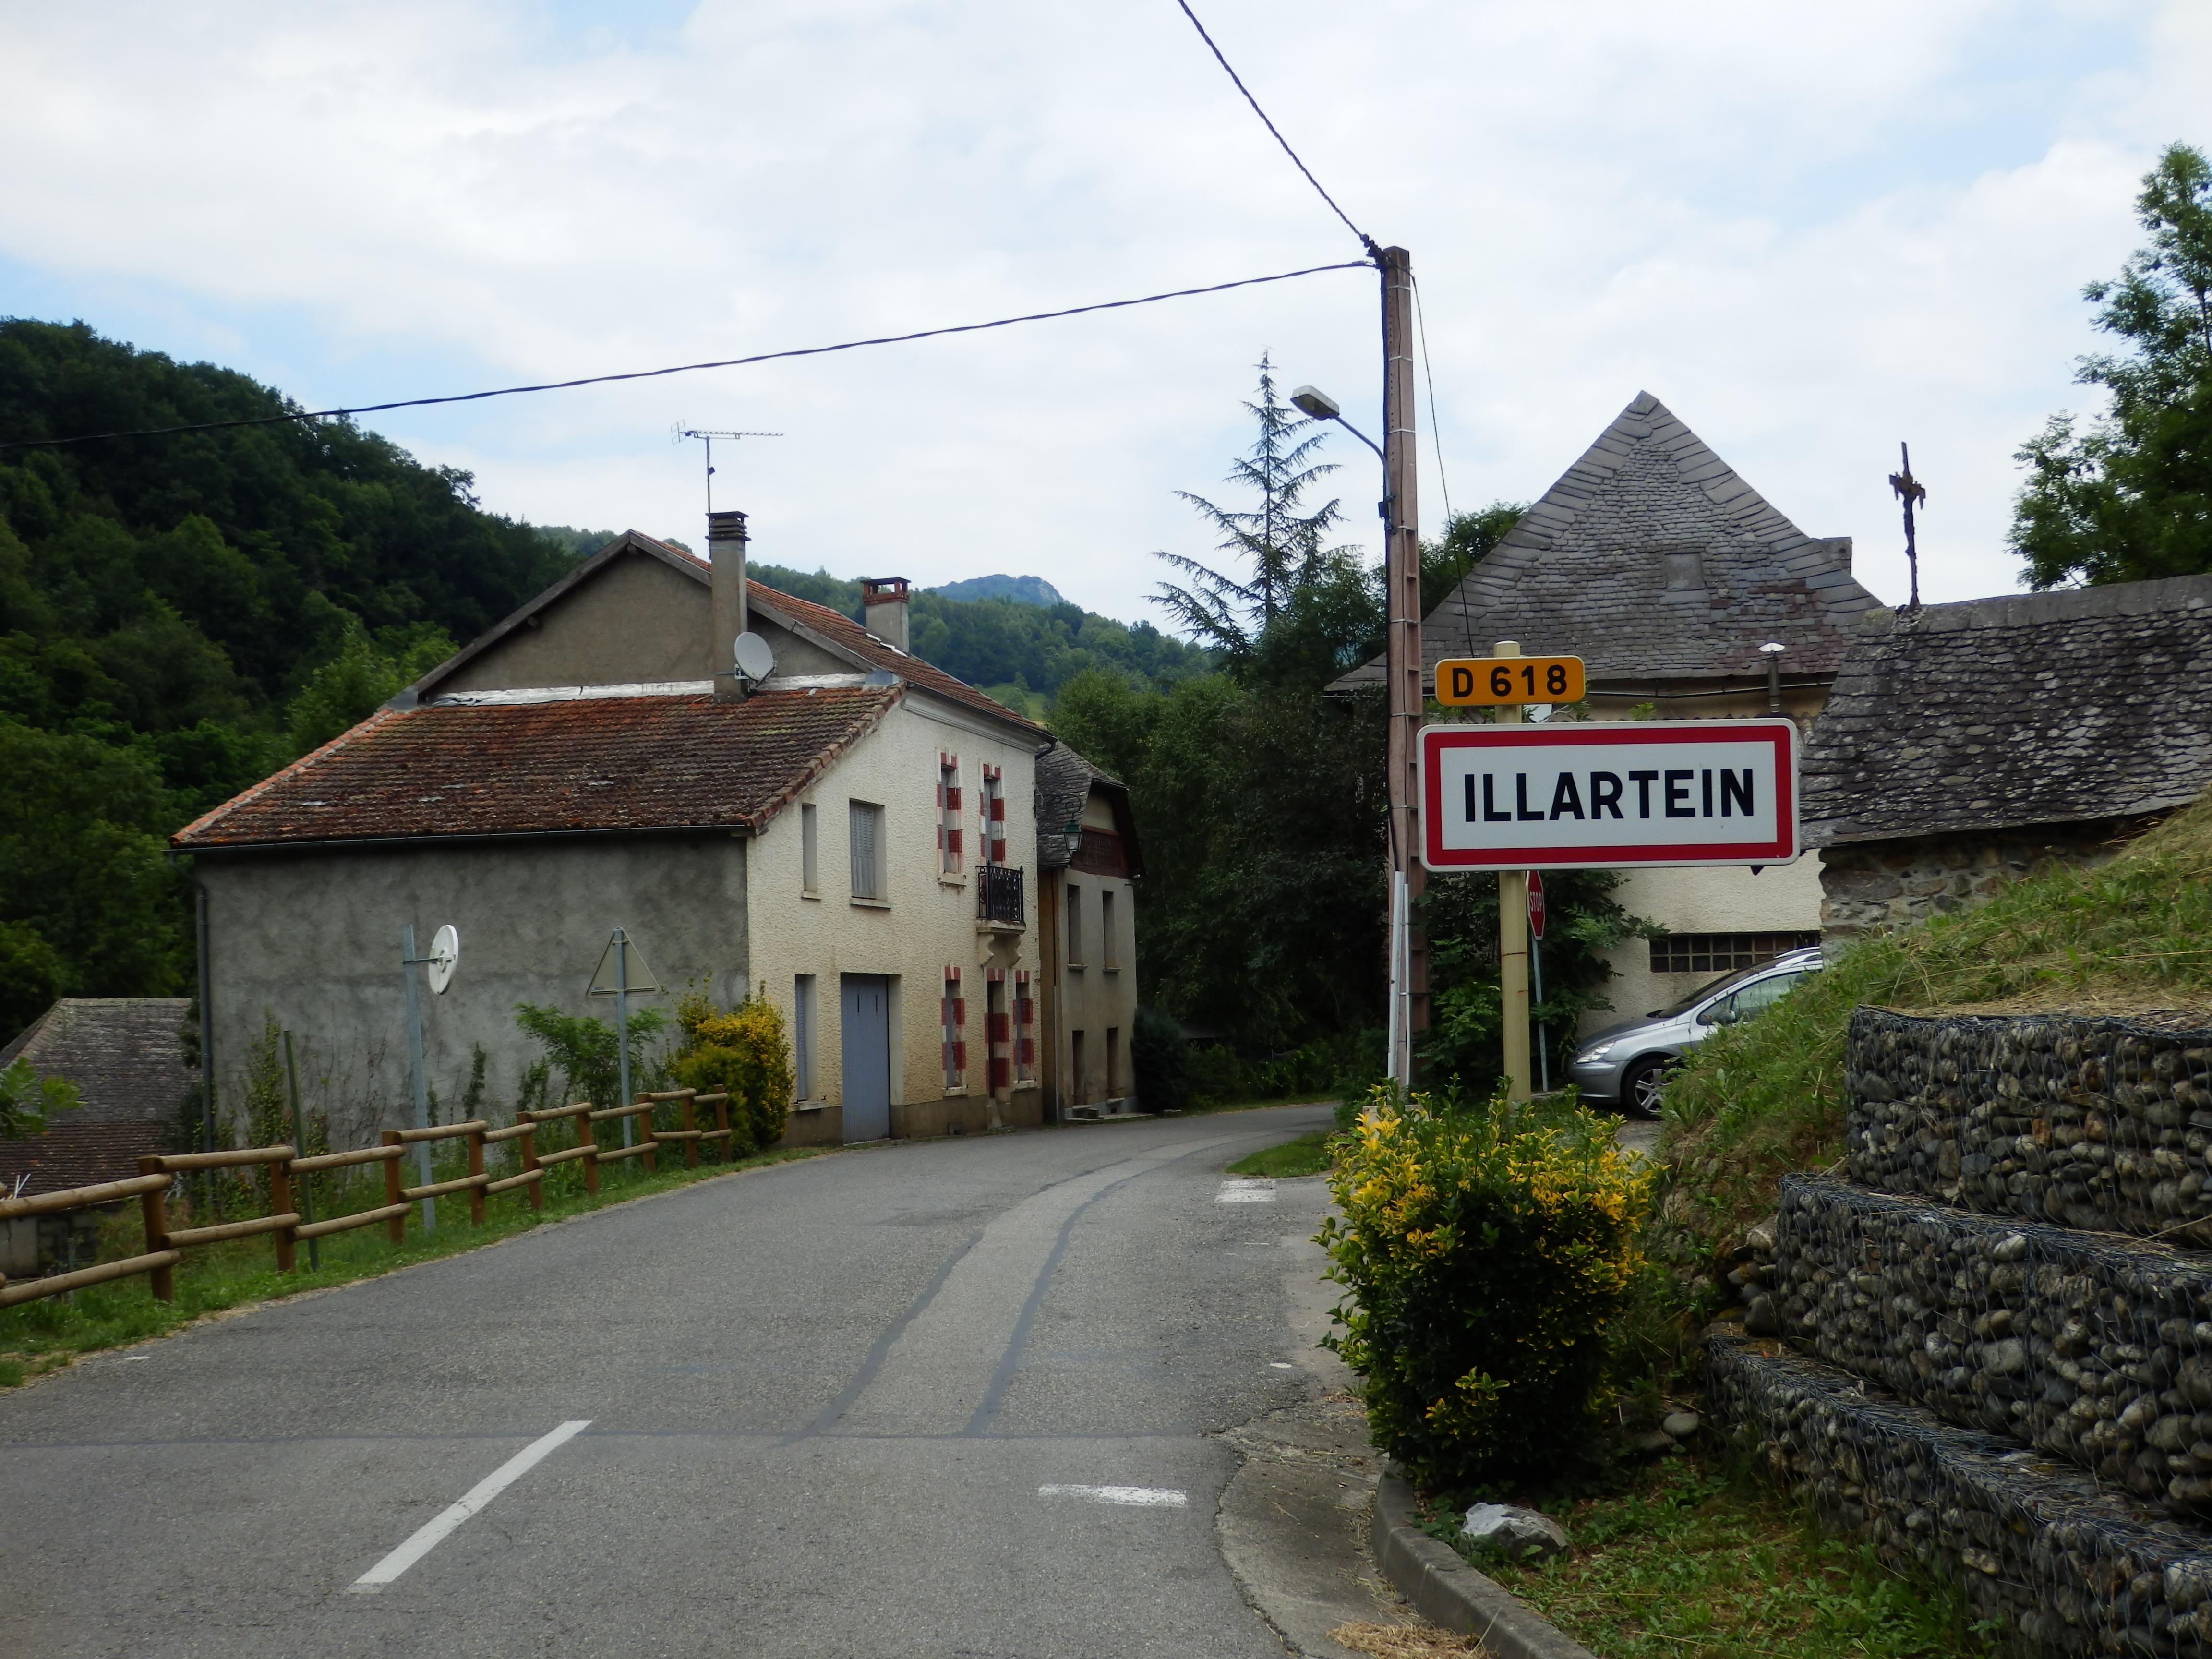 Illartein